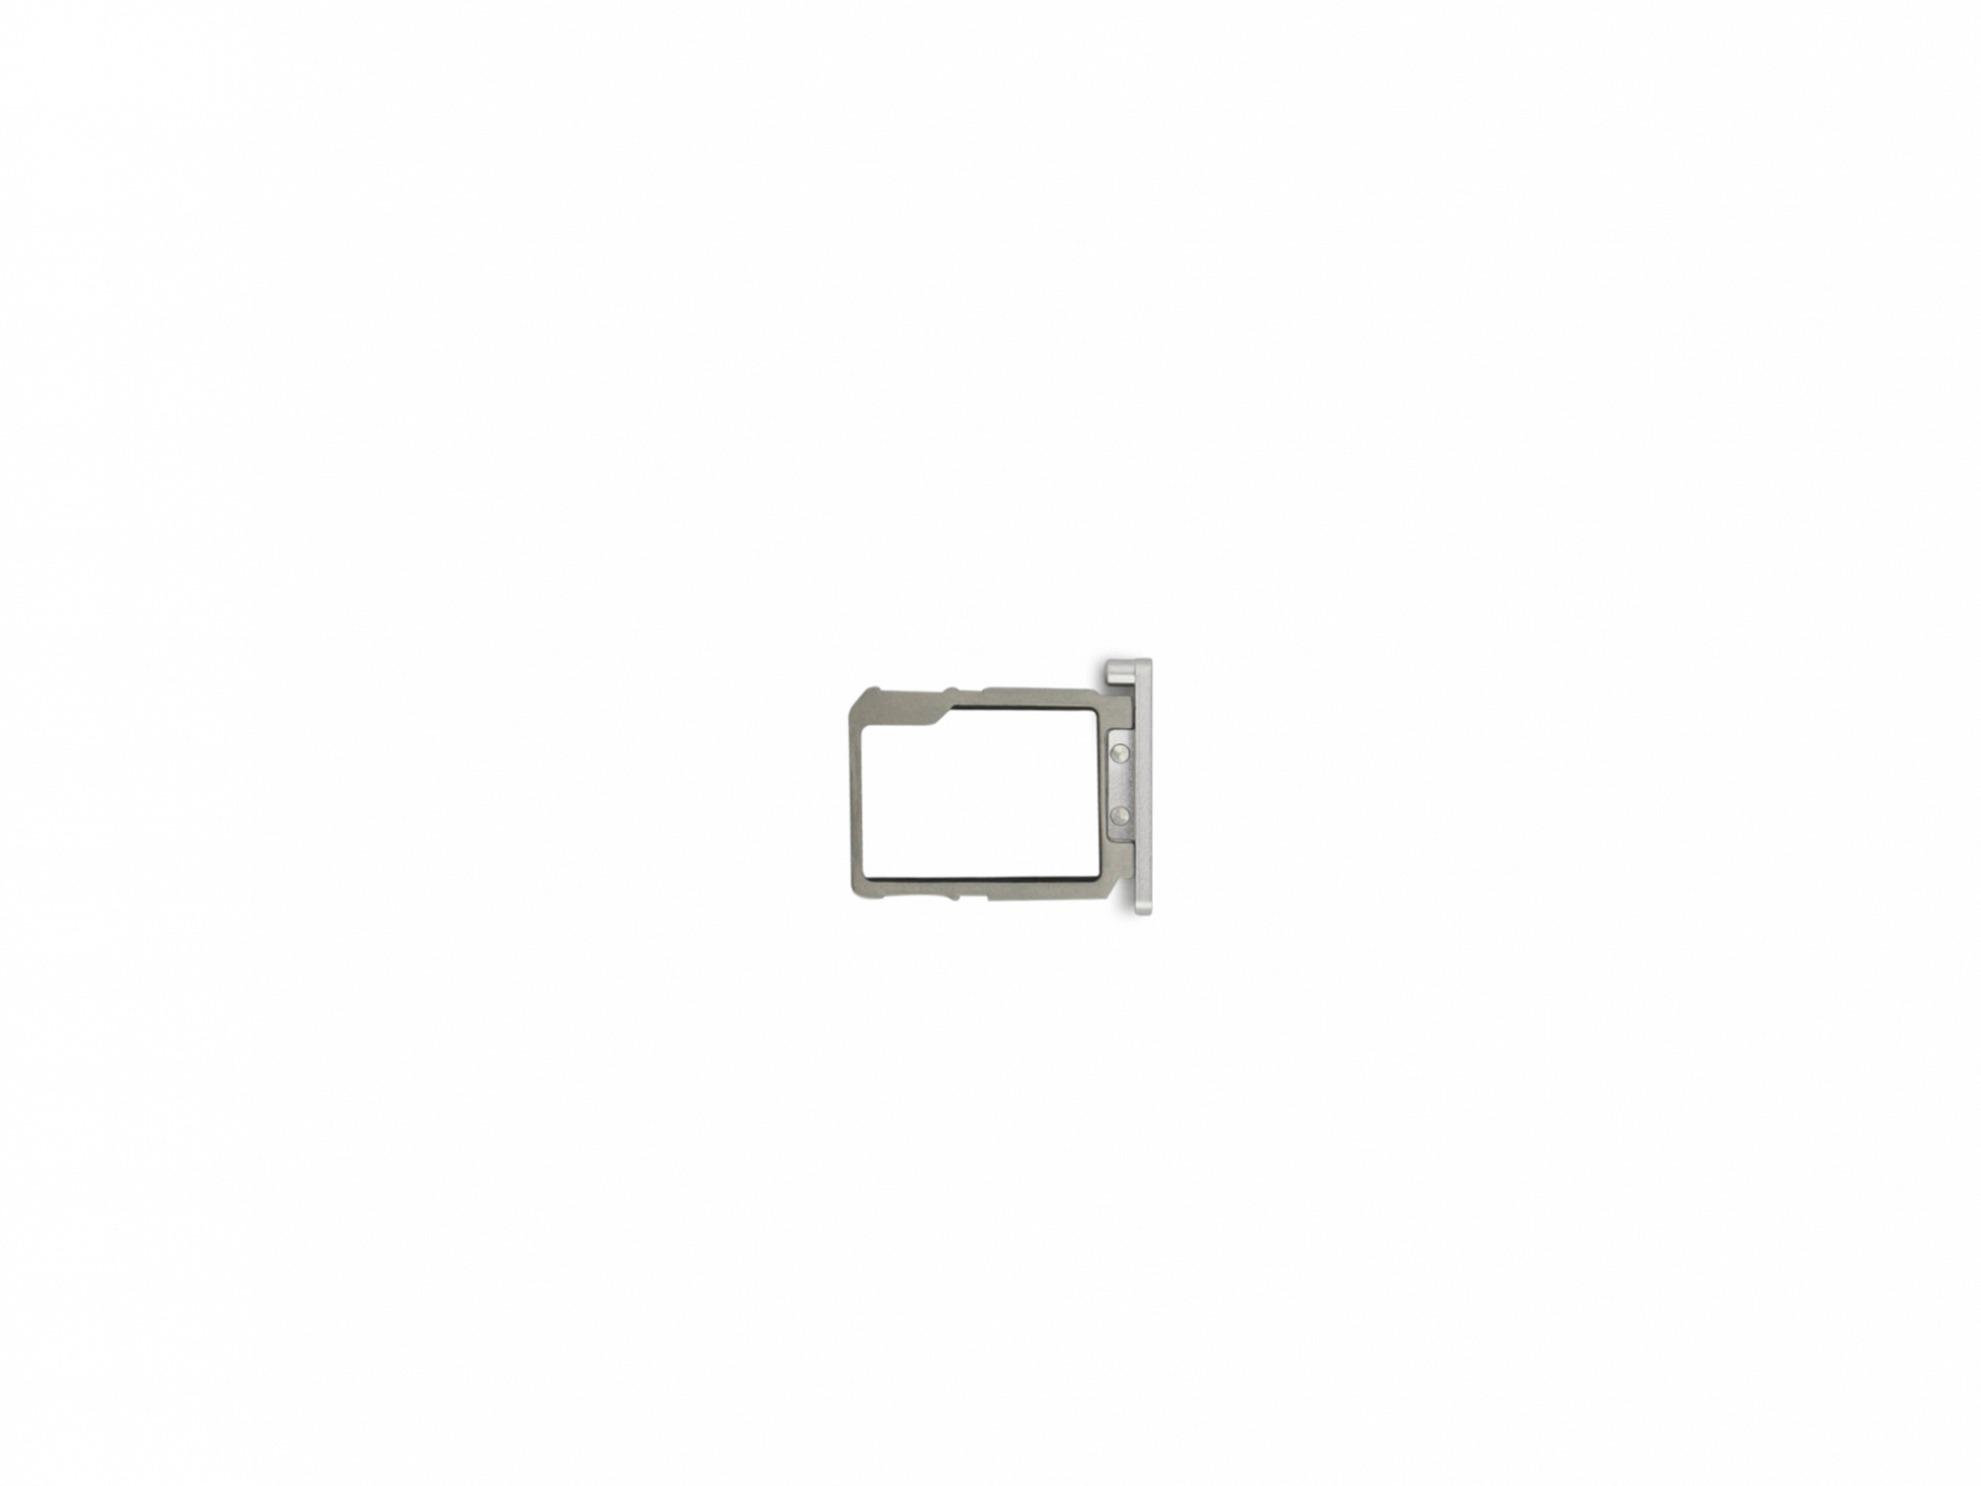 HRZ500 SD-Kartenhalter - silber